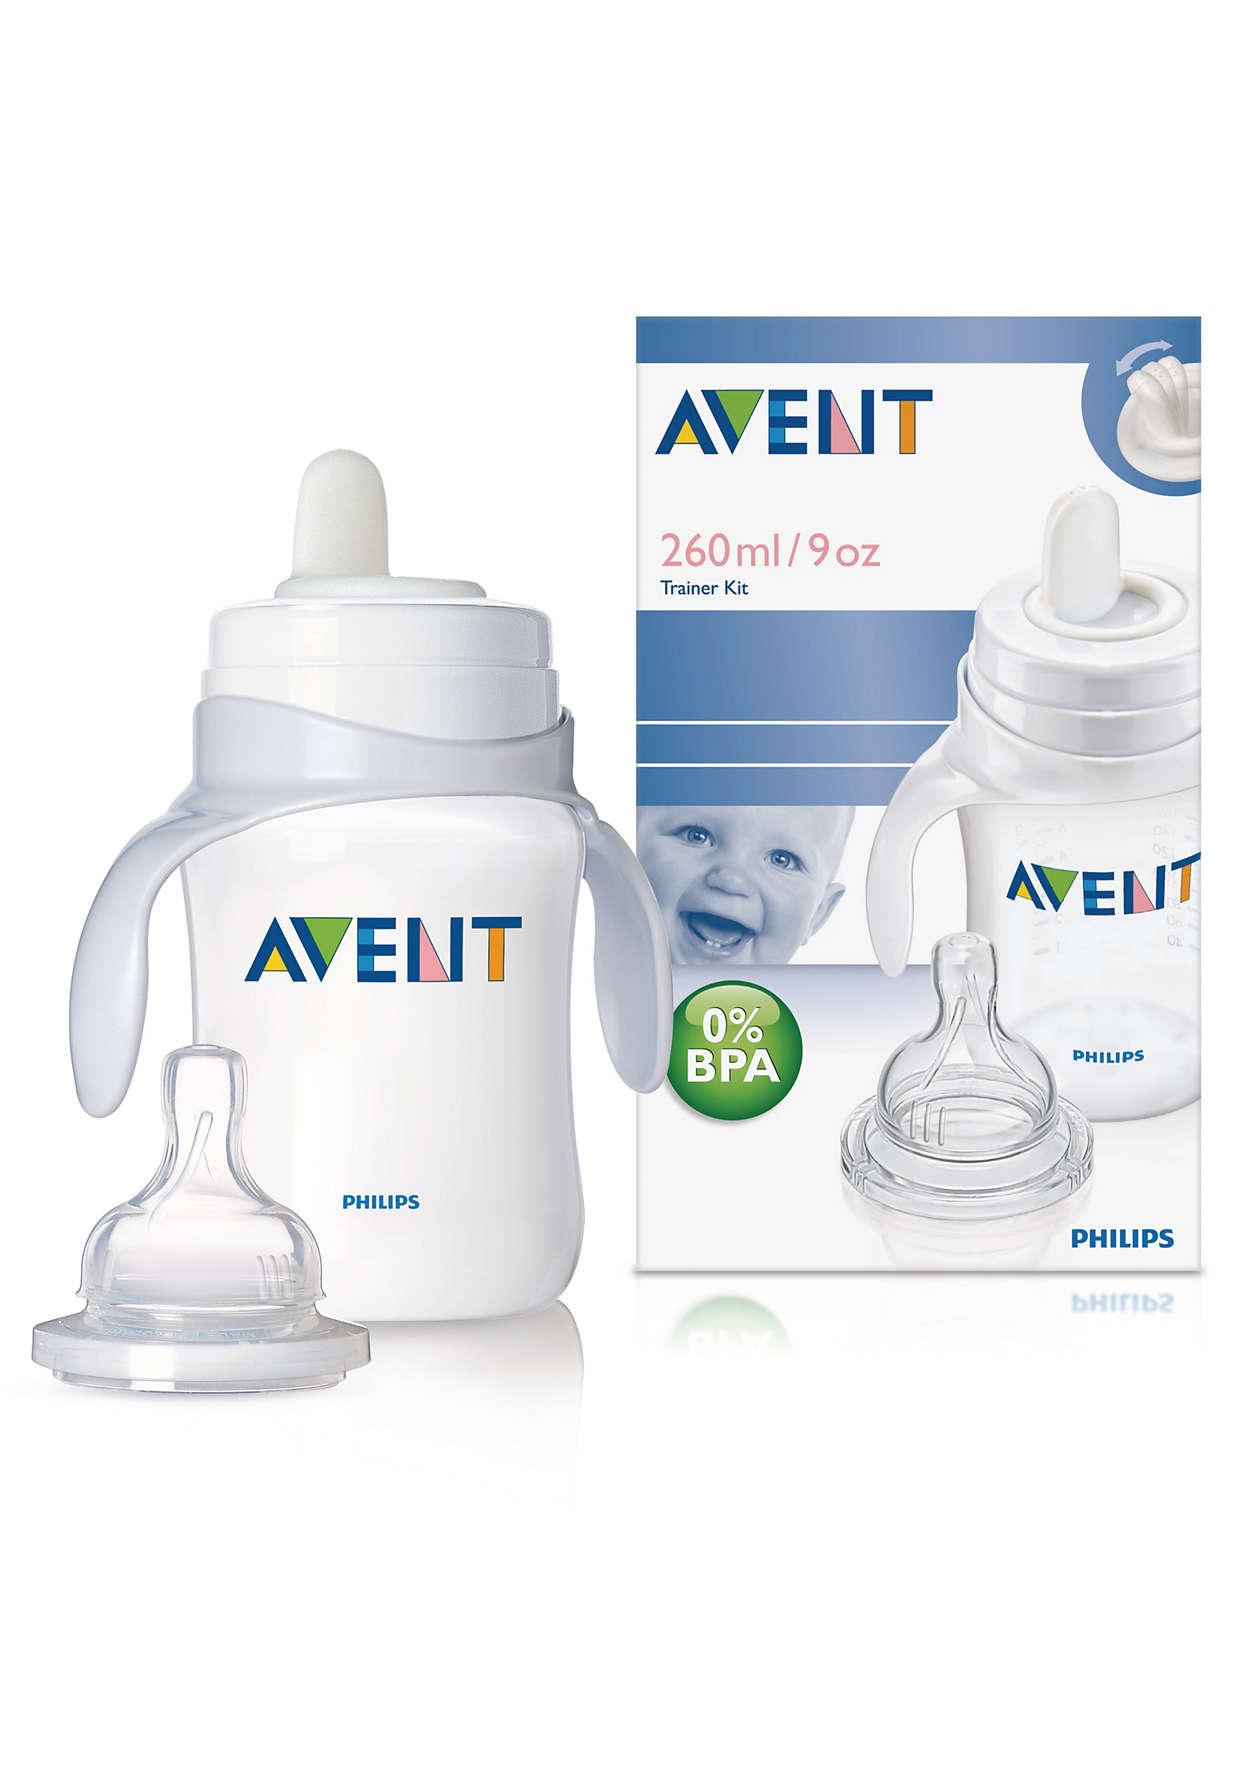 Bebin prvi korak ka korištenju šalice